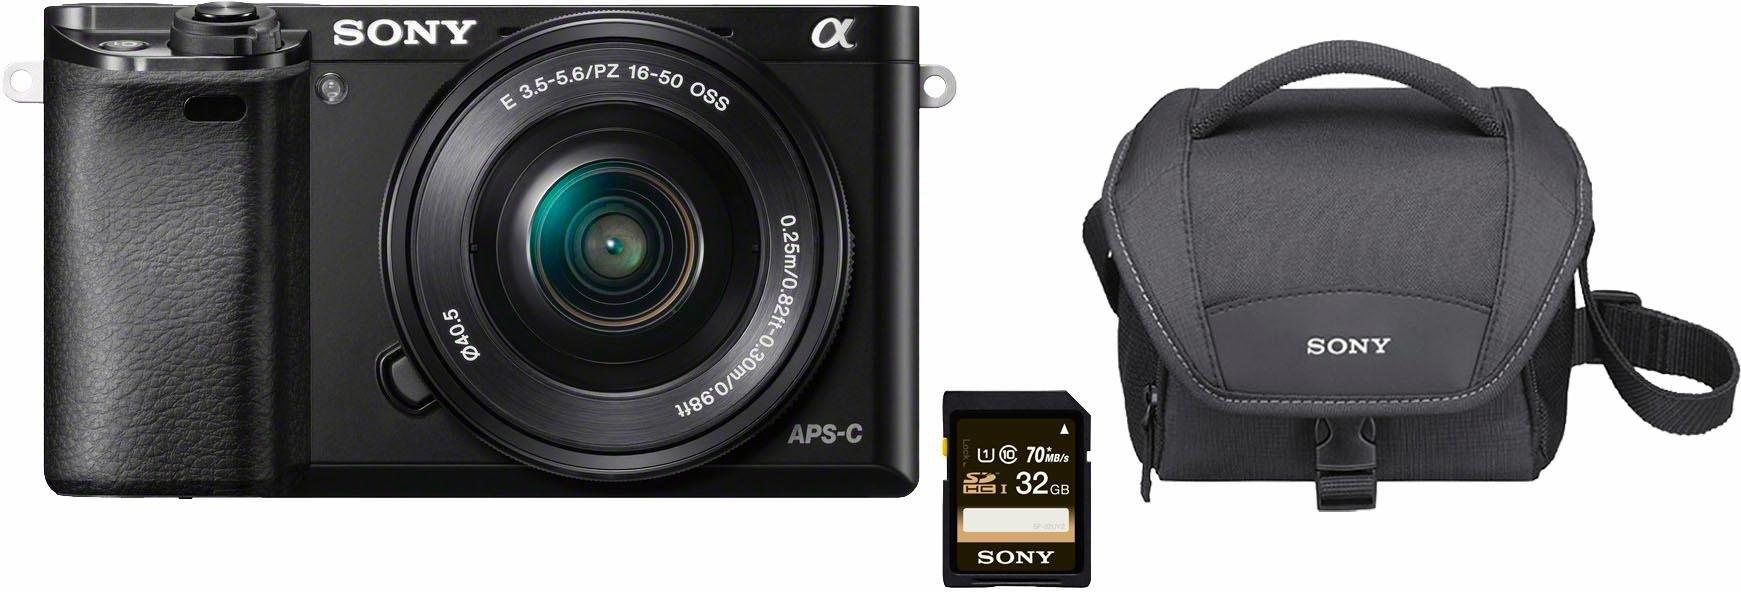 Sony Alpha ILCE-6000L systeemcamera, 16-50 mm zoom, incl. tas, 32 GB SD-kaart online kopen op otto.nl